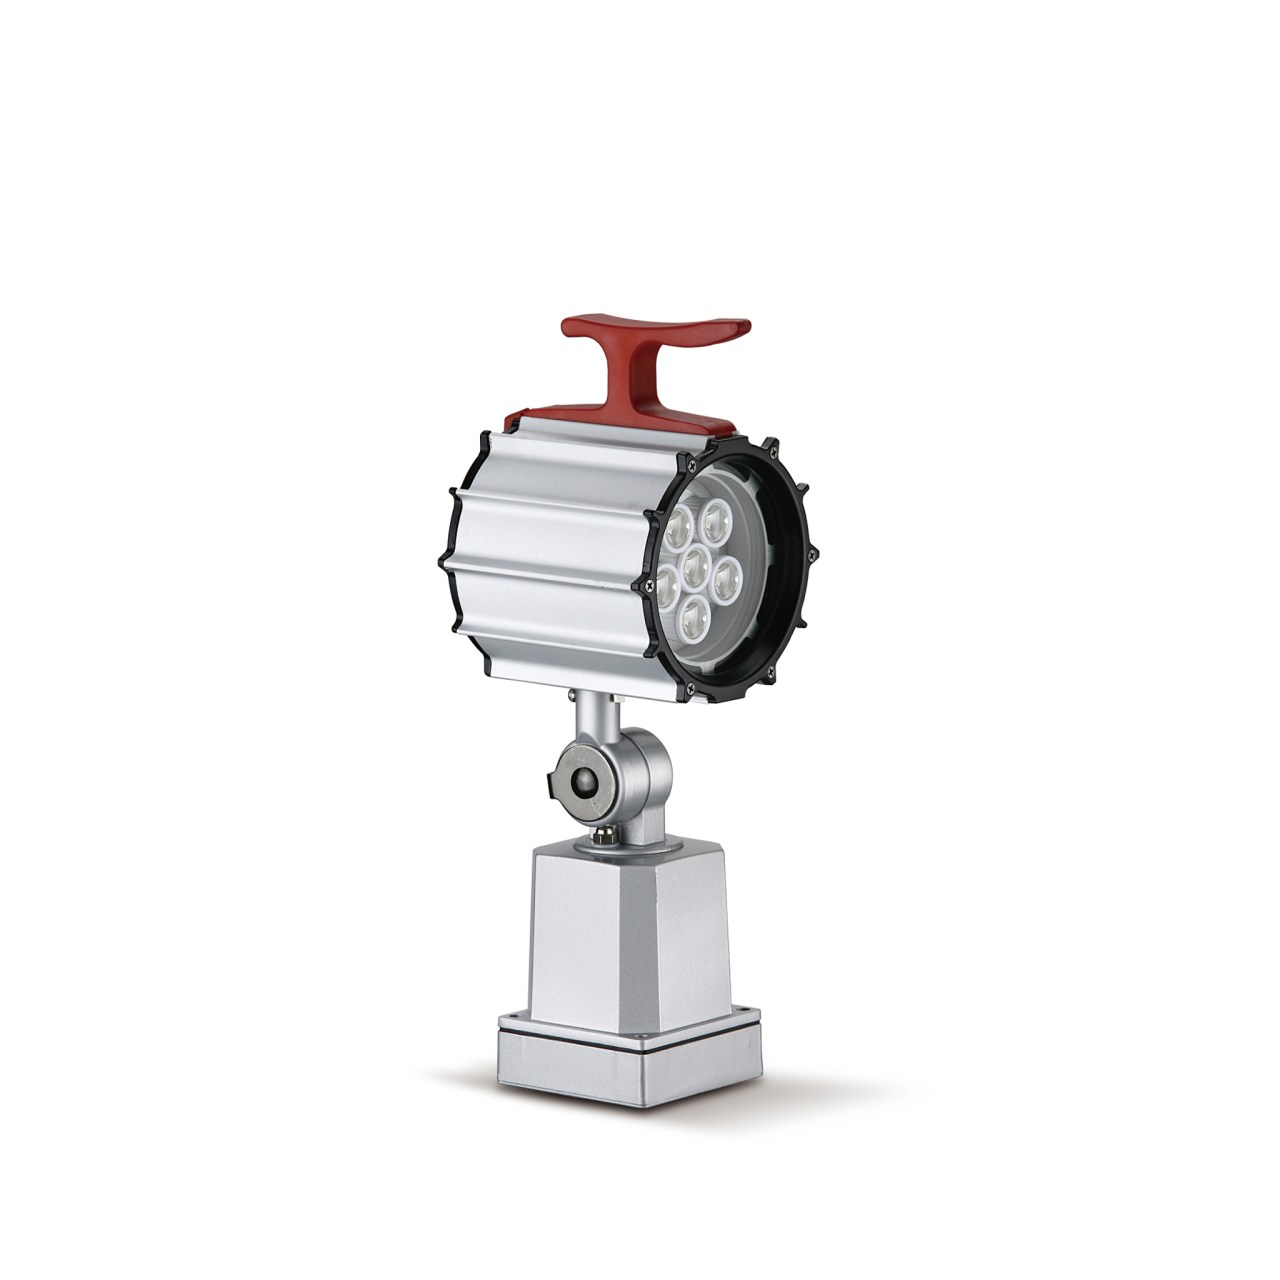 LED-Maschinenleuchte SIS-Licht M-Lite IP 65 RSL